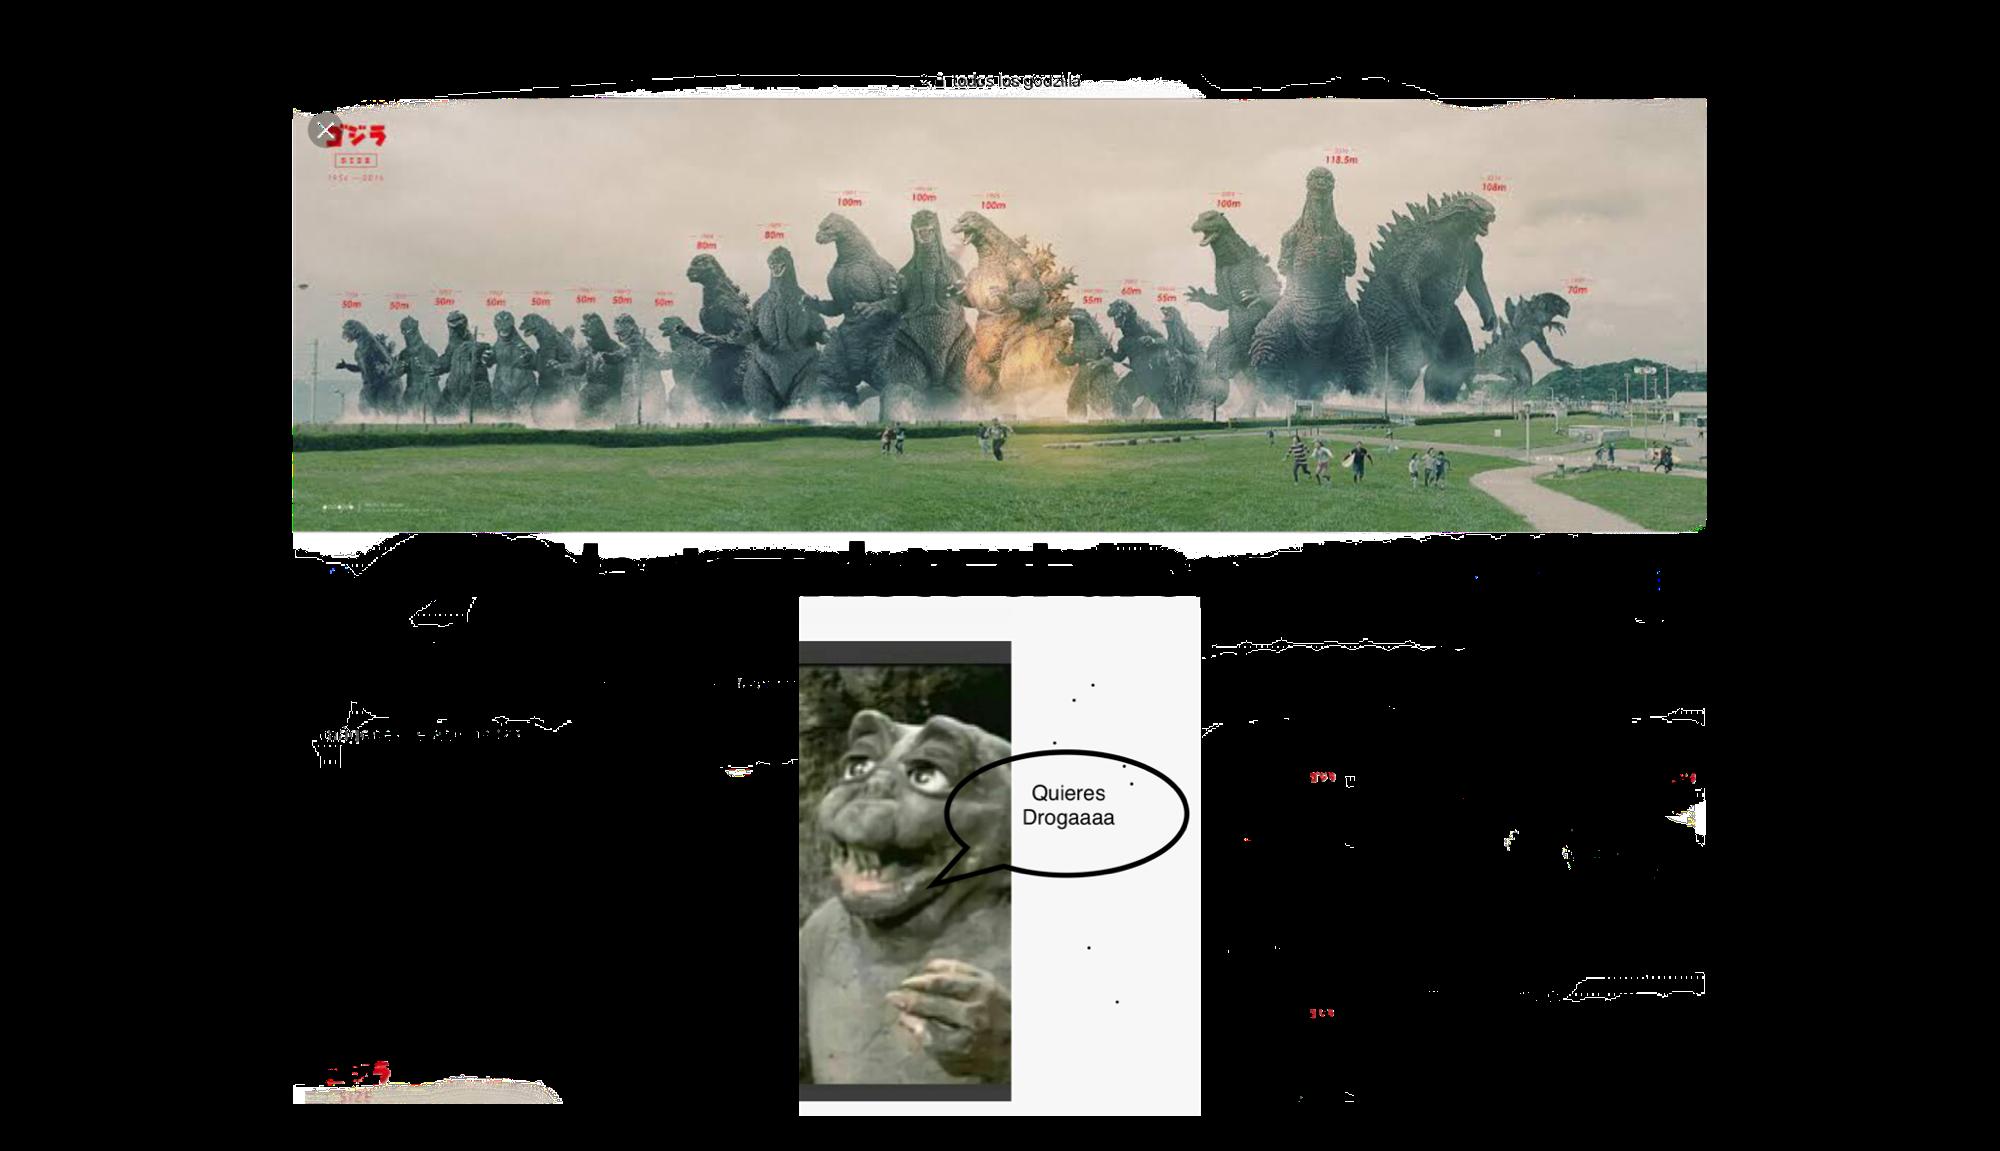 Meme inventado por mi